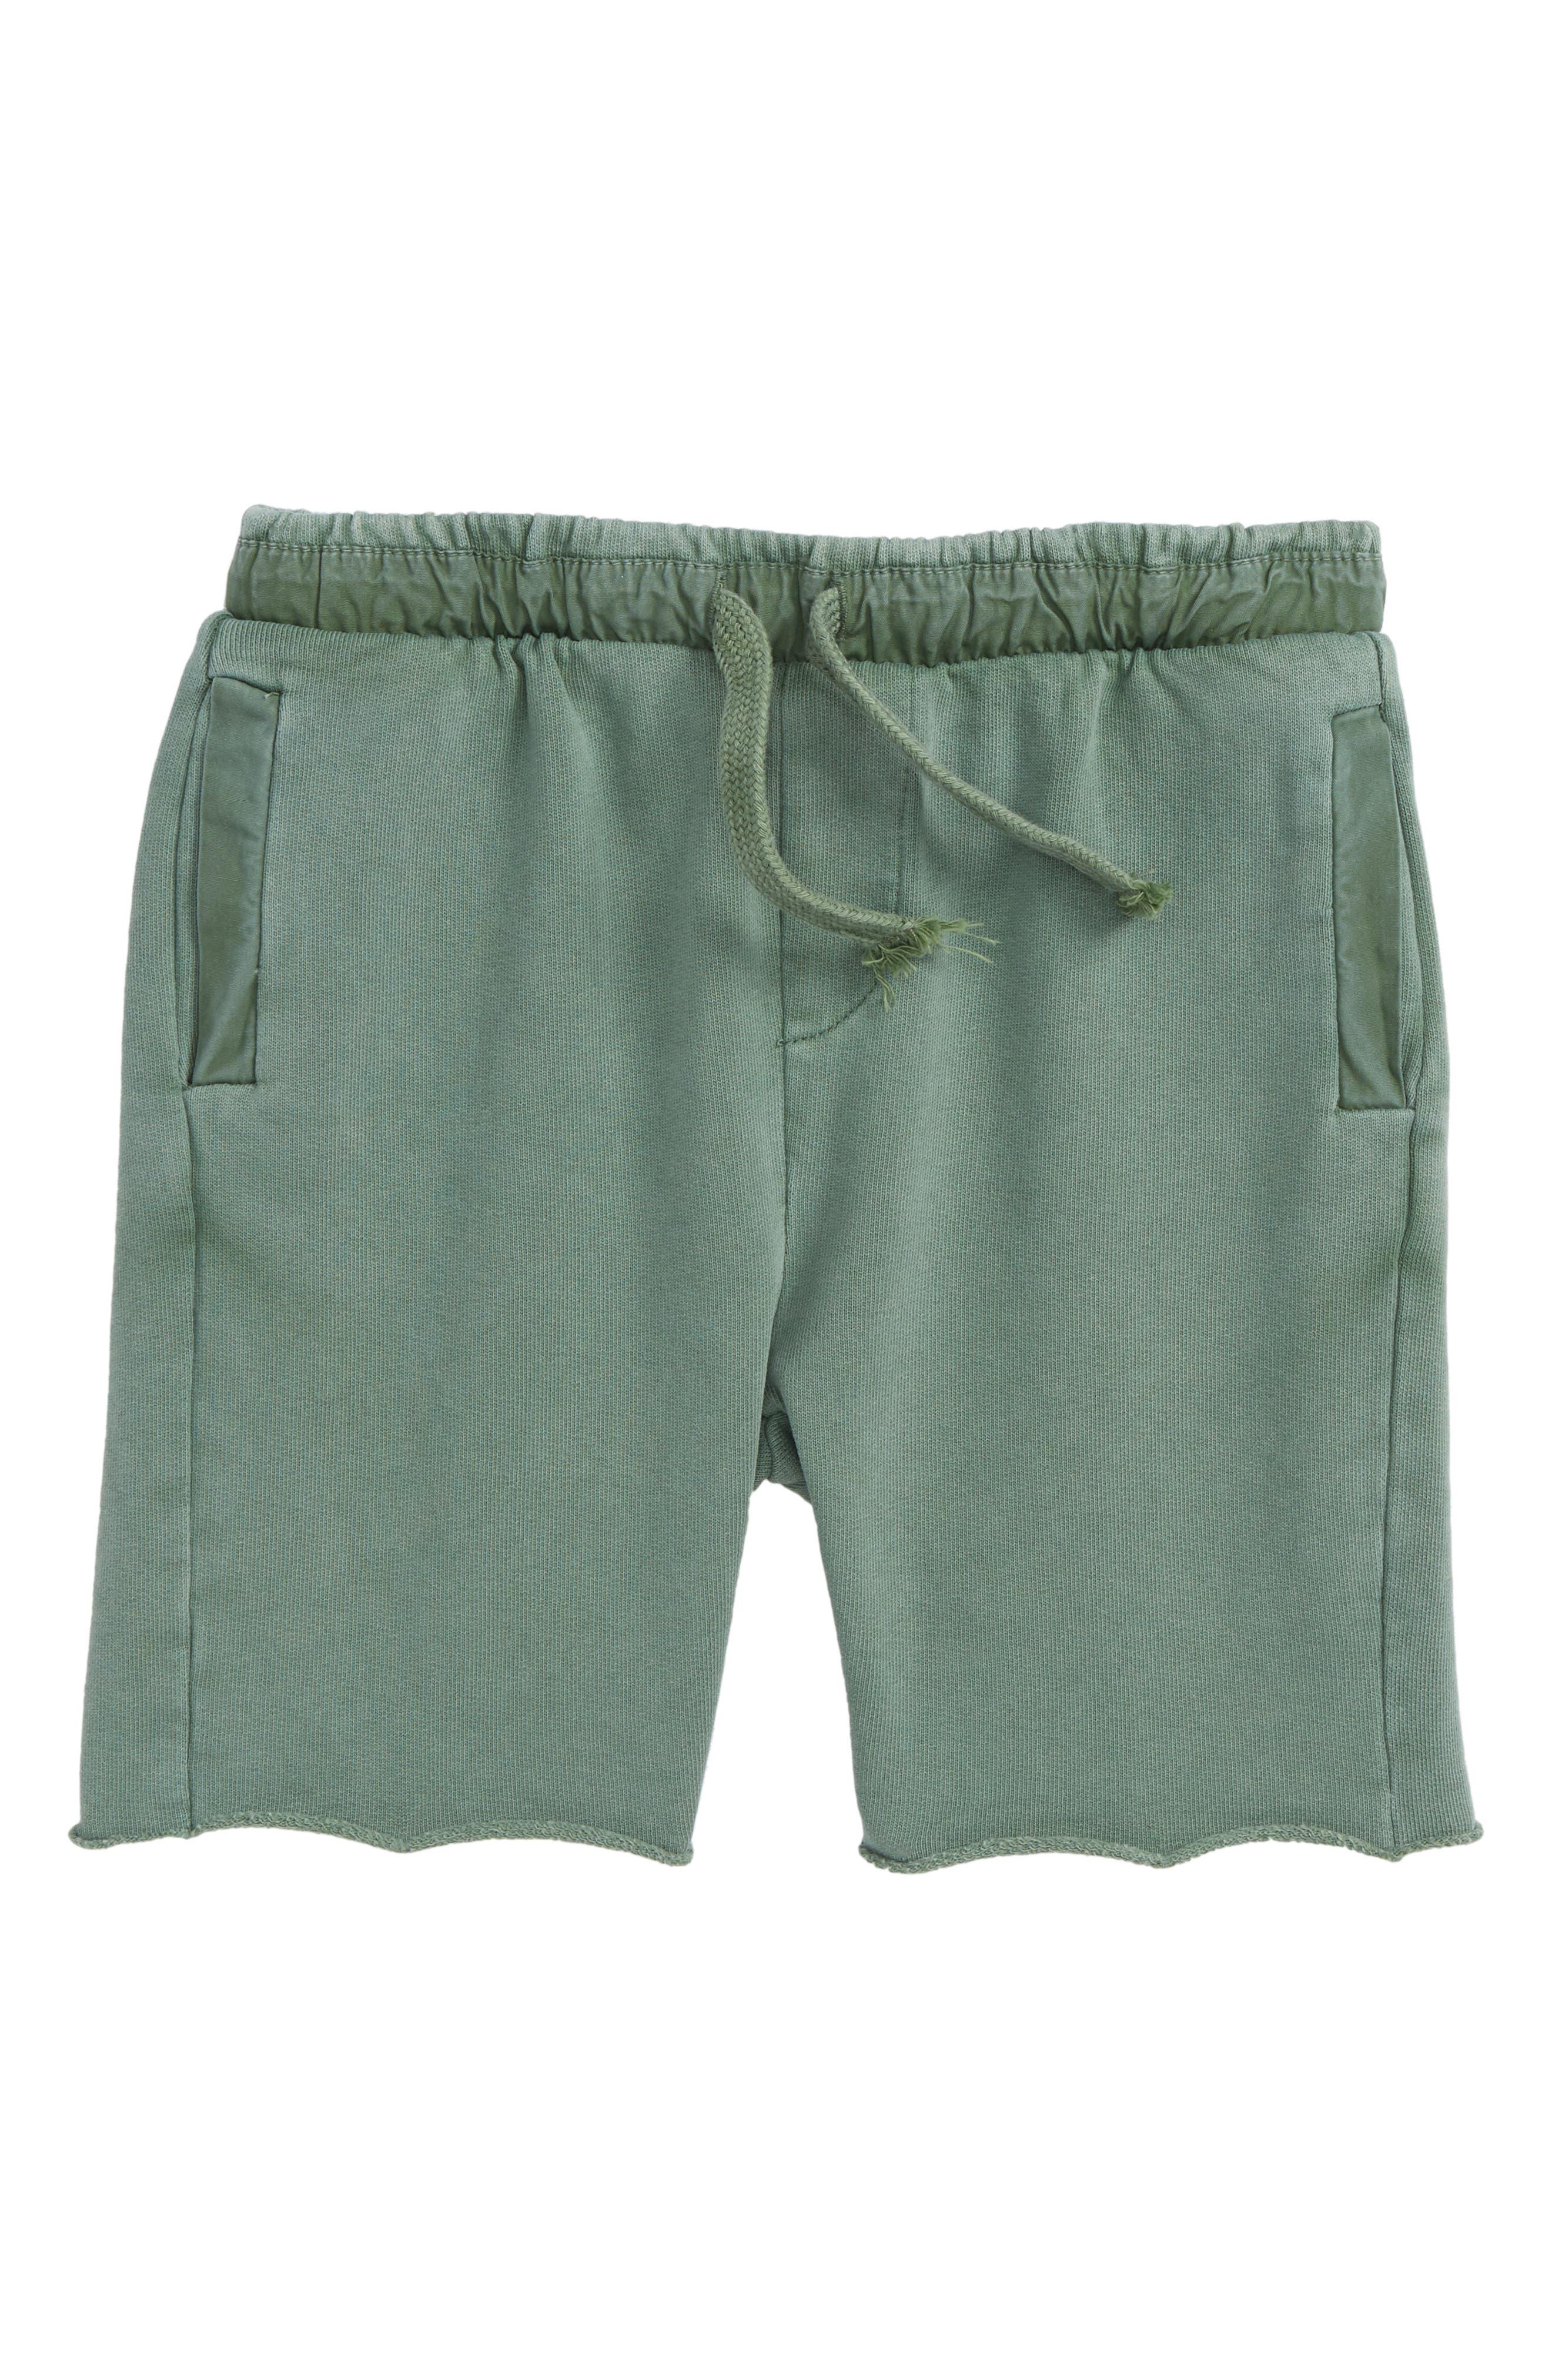 Kids Cullen Organic Cotton Shorts,                             Main thumbnail 1, color,                             370